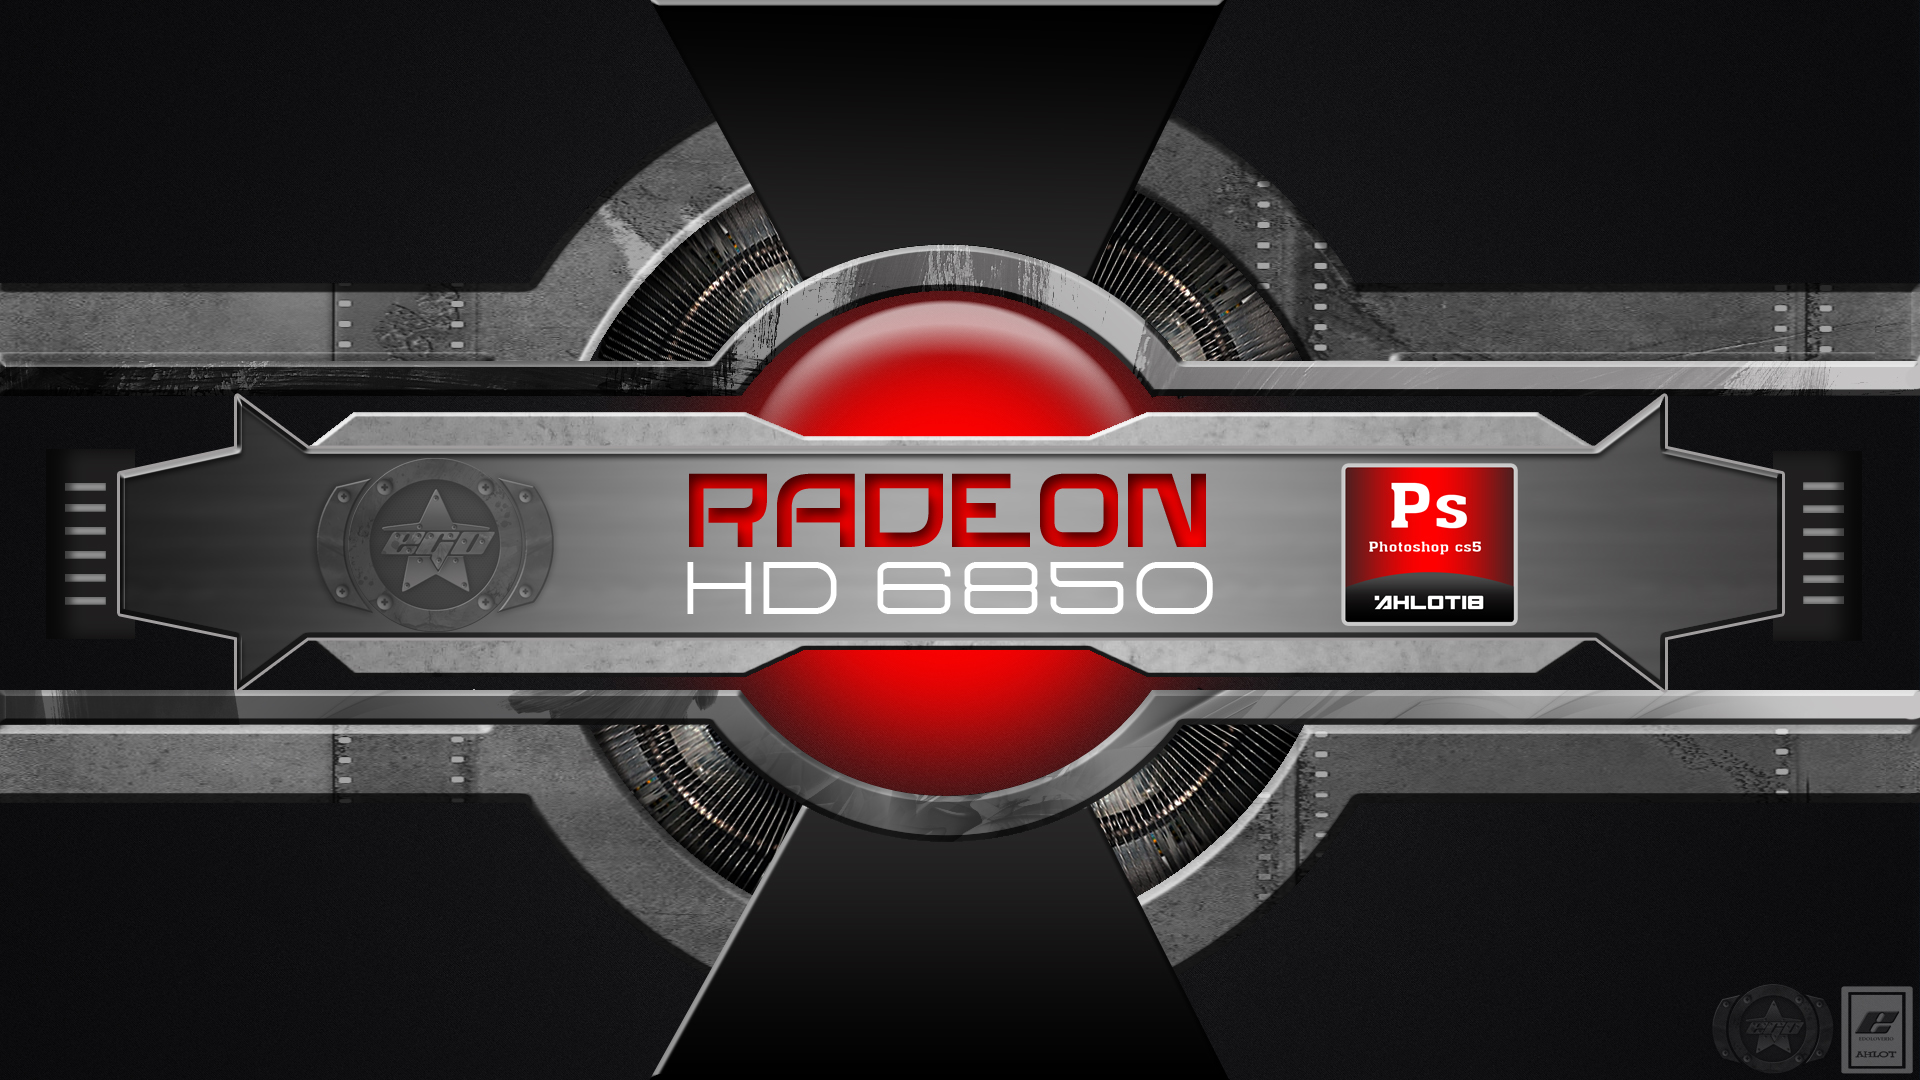 Amd Radeon wallpaper 125438 1920x1080